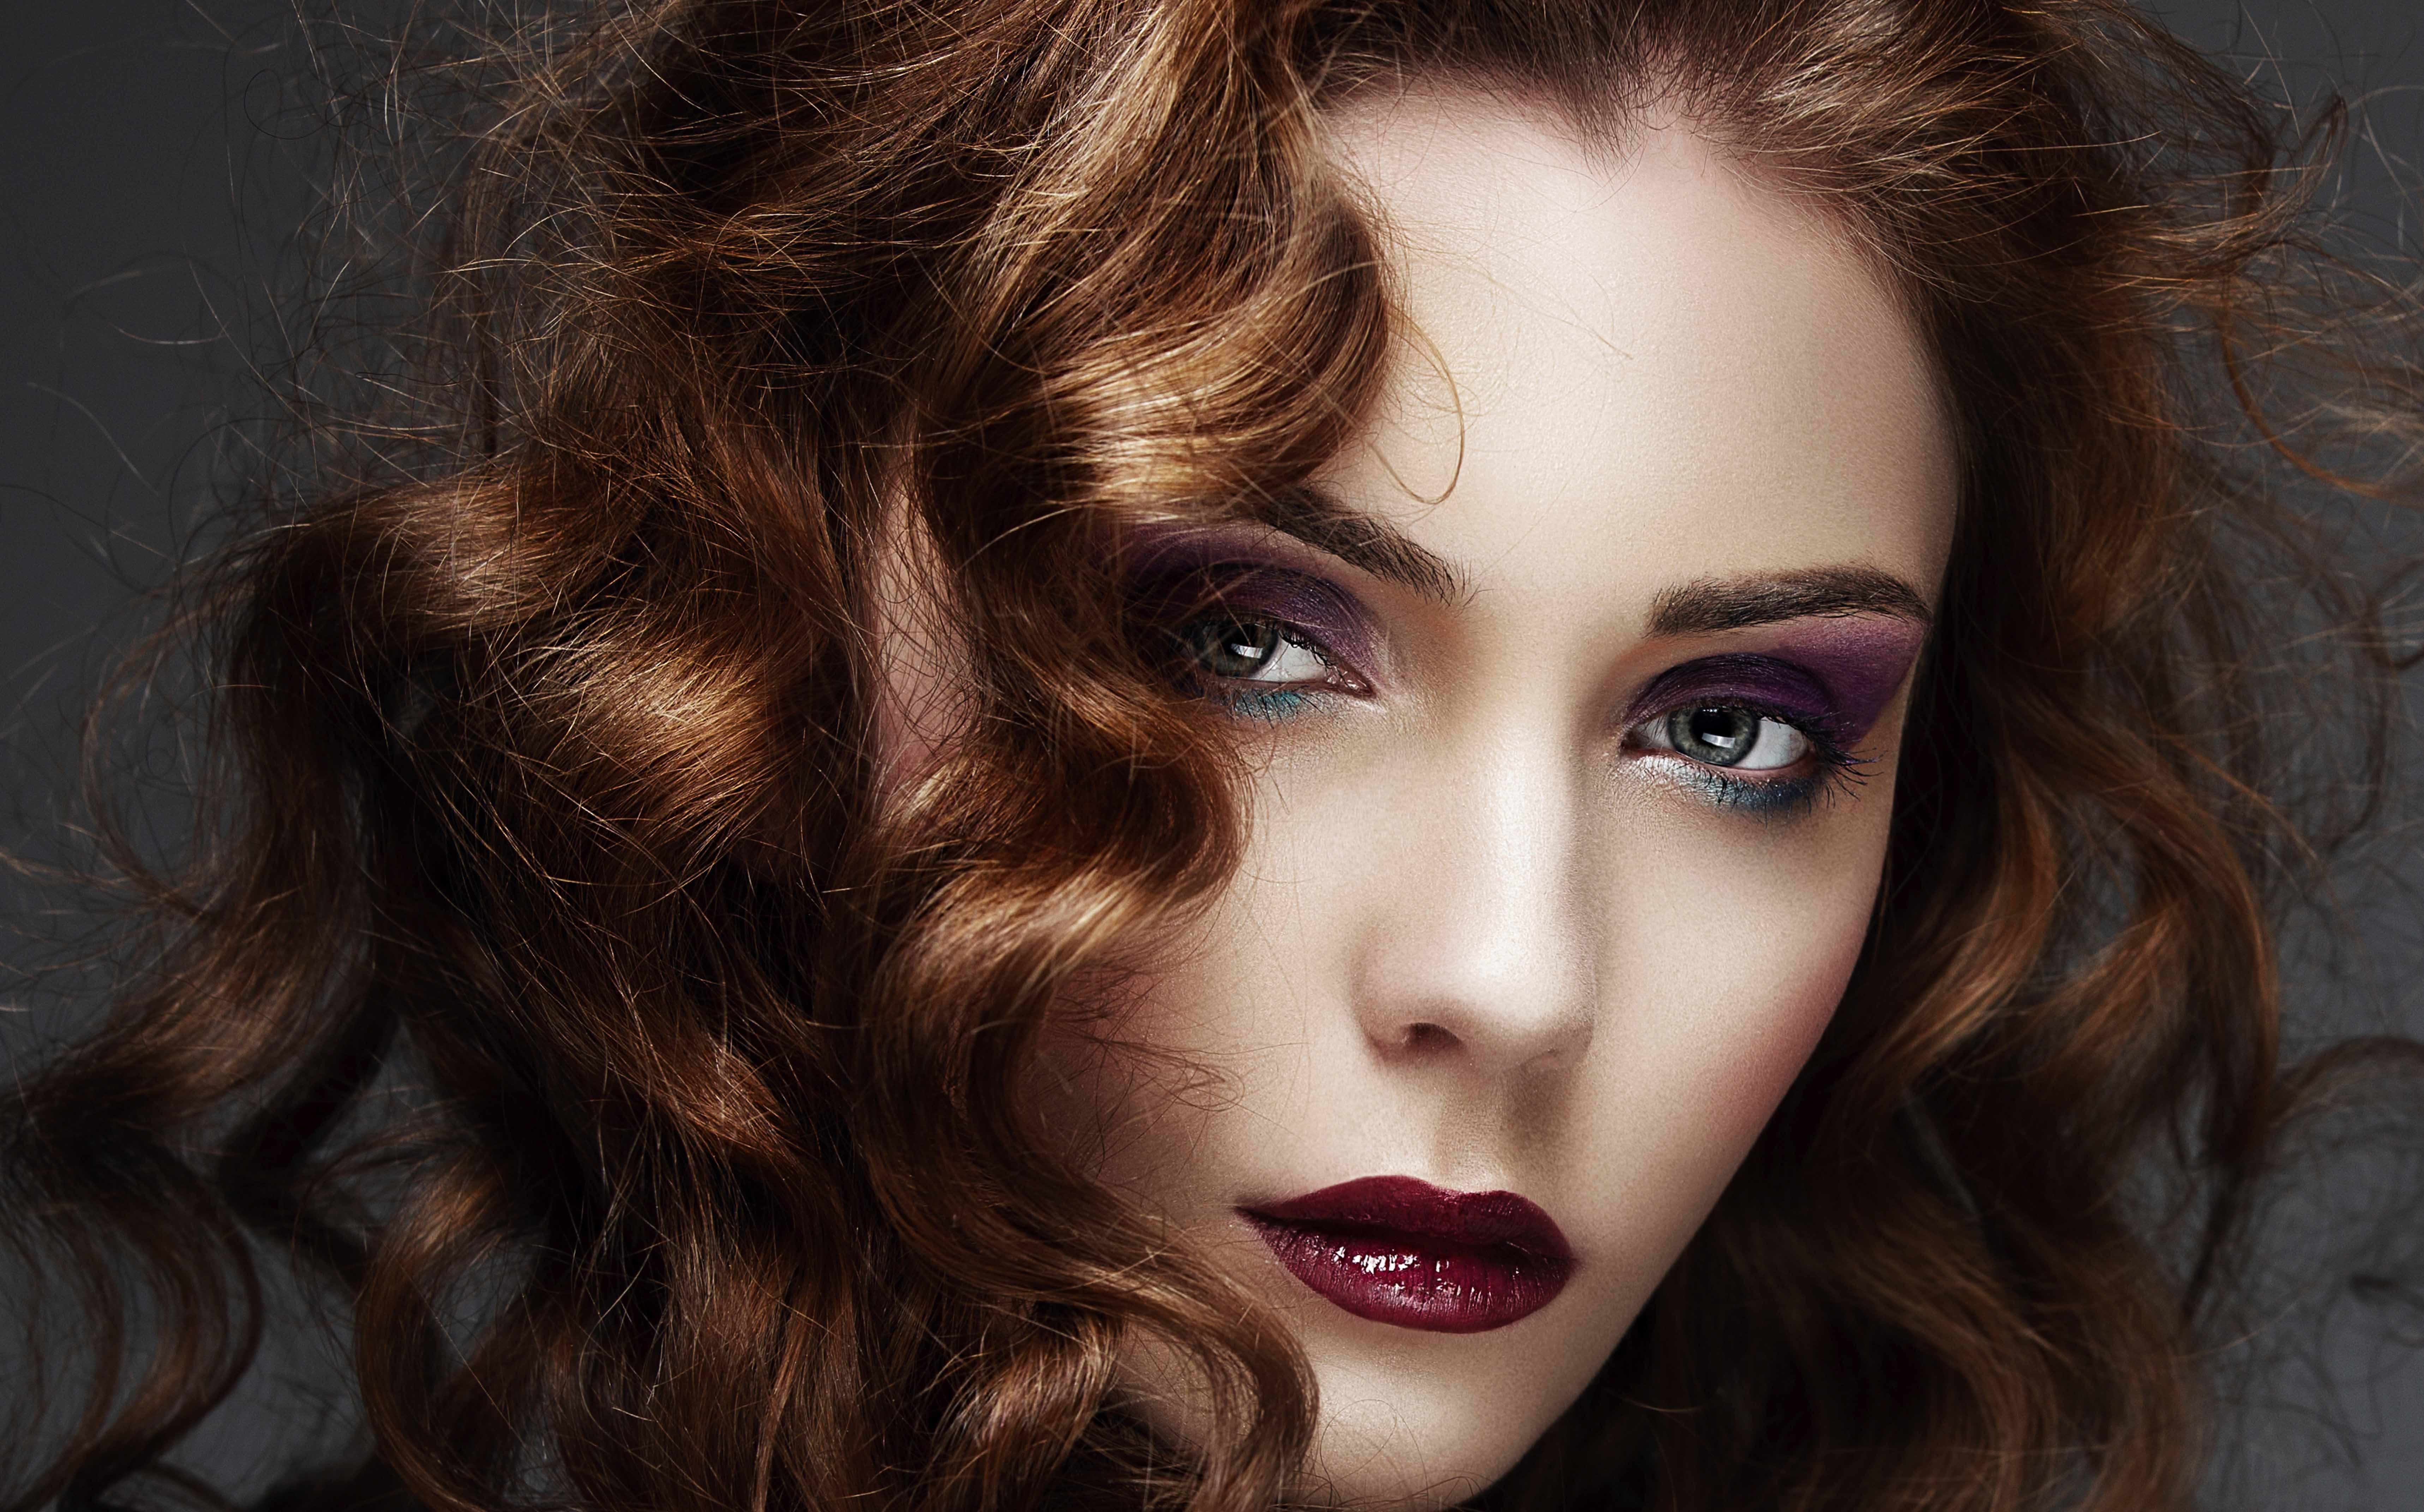 zephir-parrucchieri-taglio-capelli-spessi-consigli-capelli-ascona